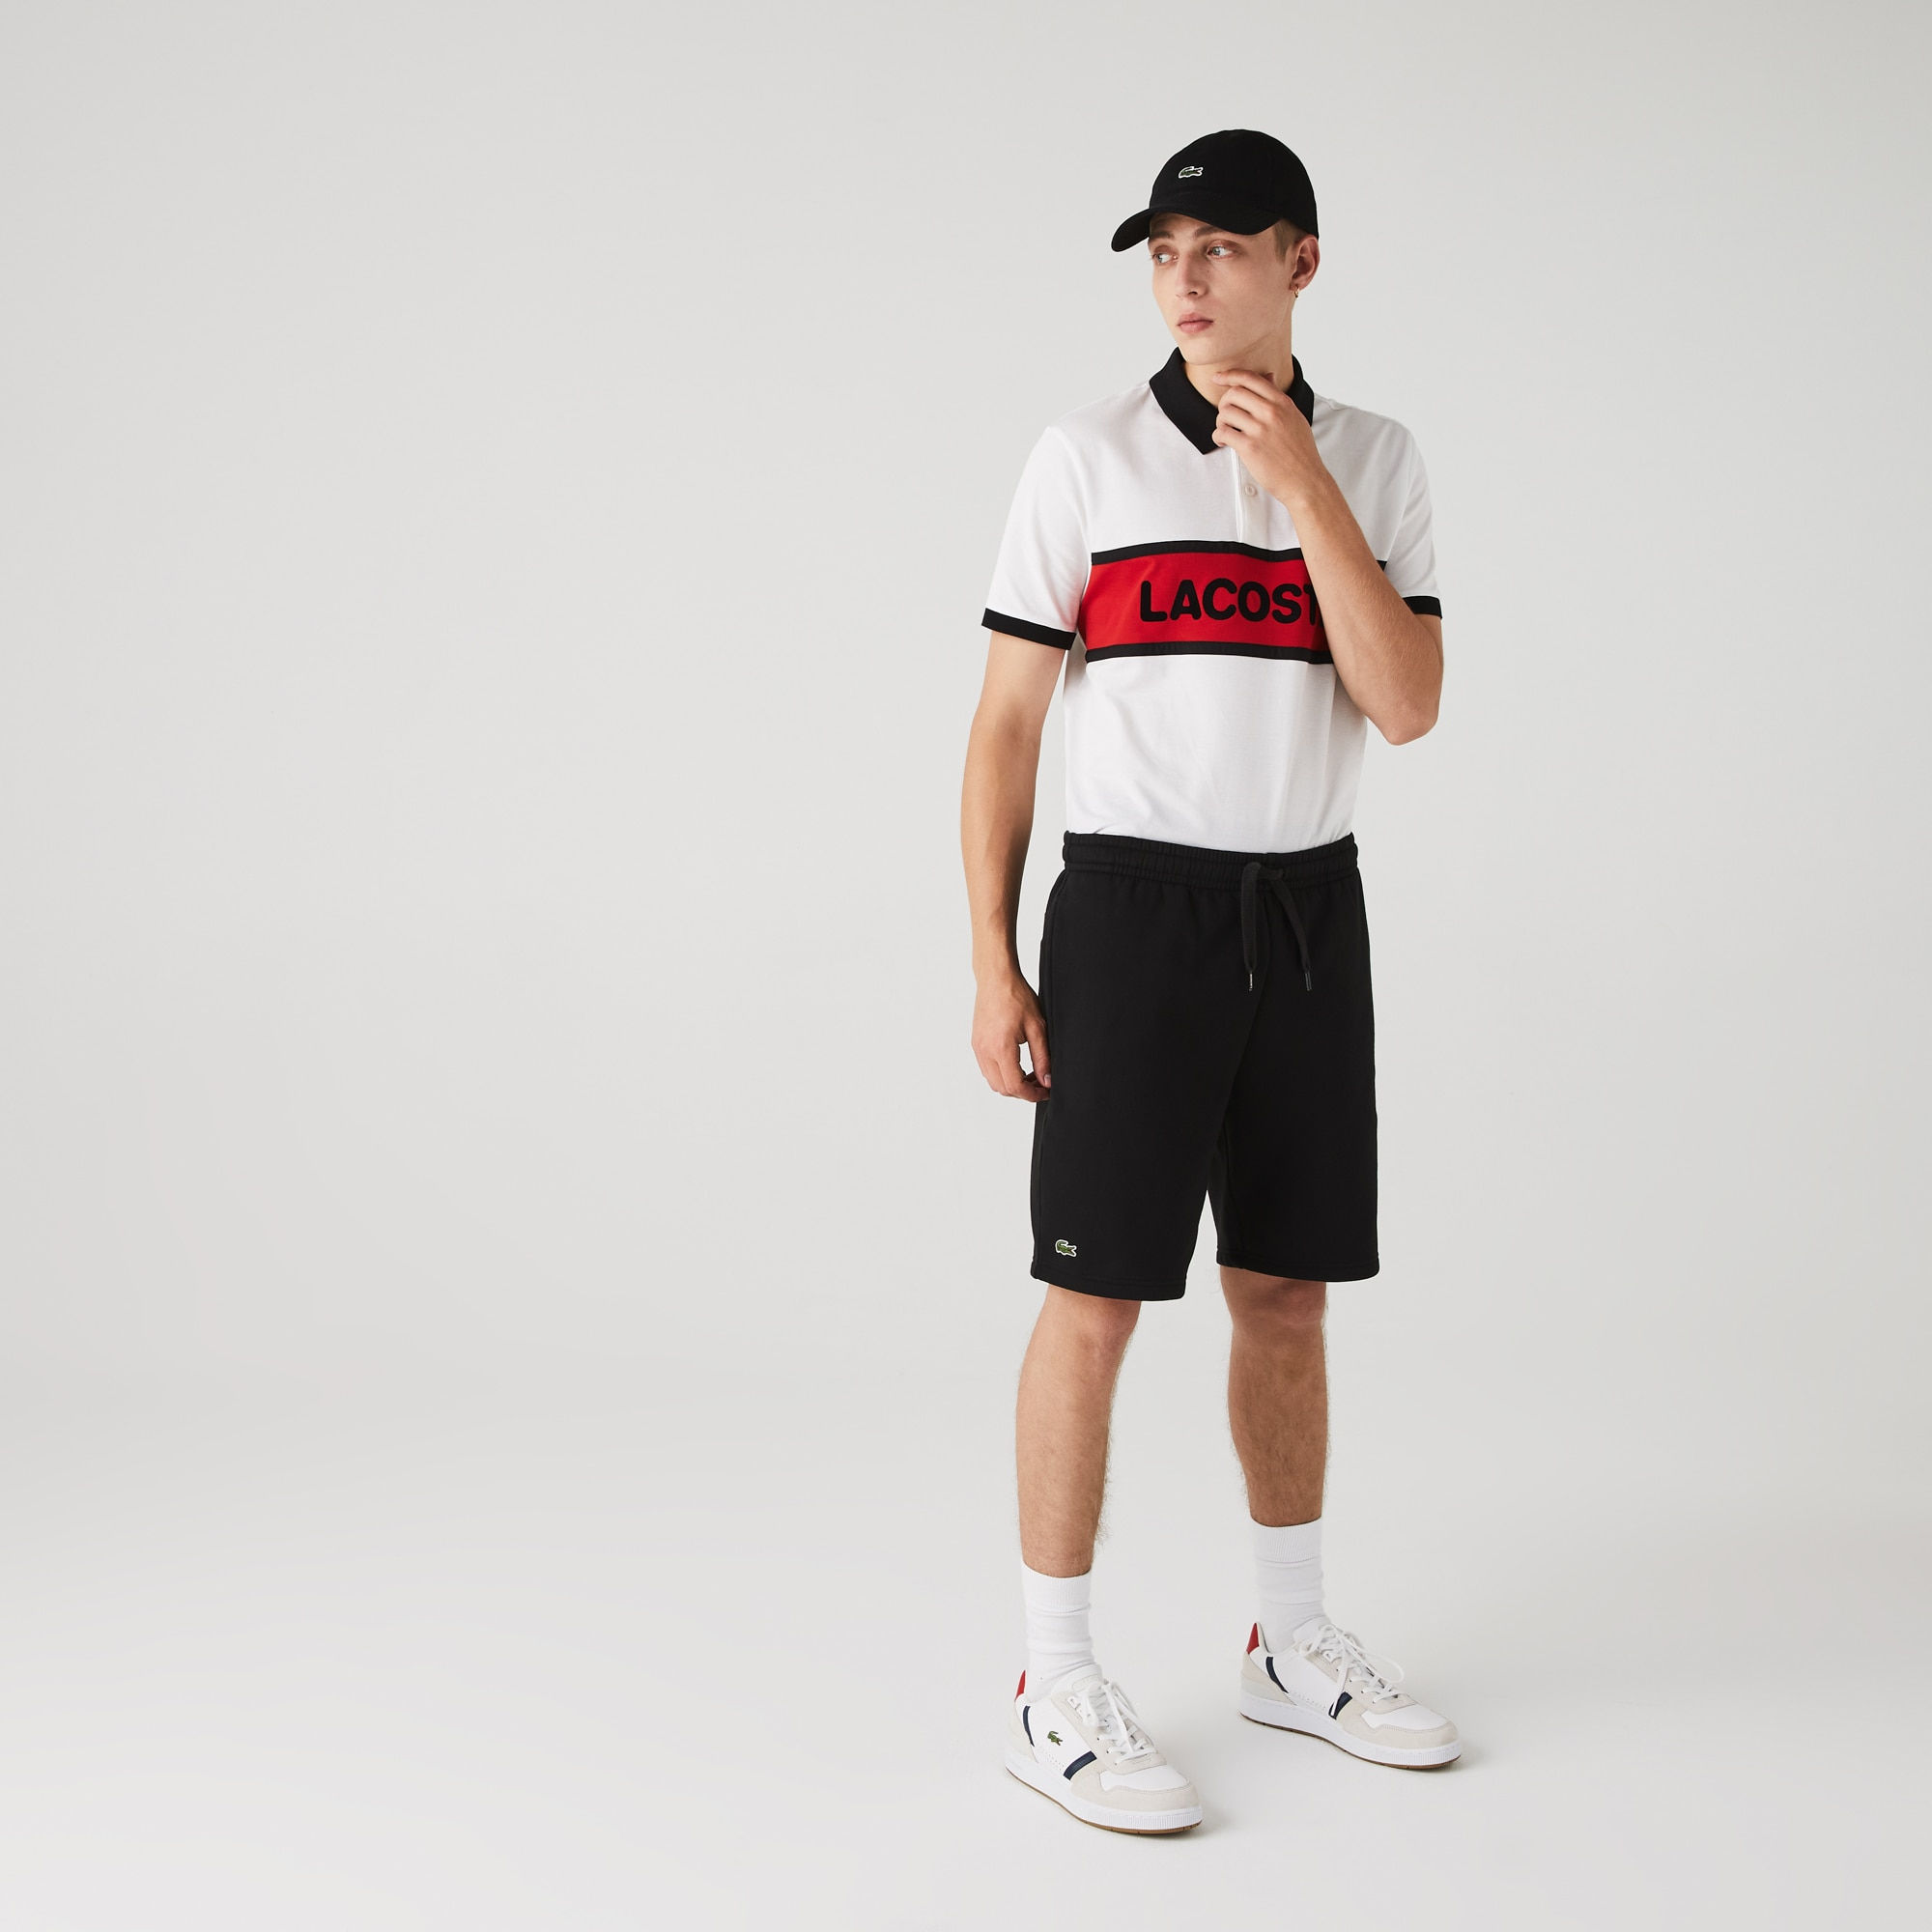 Sport Lacoste Fleece Tennis Men's Shorts E9D2HI